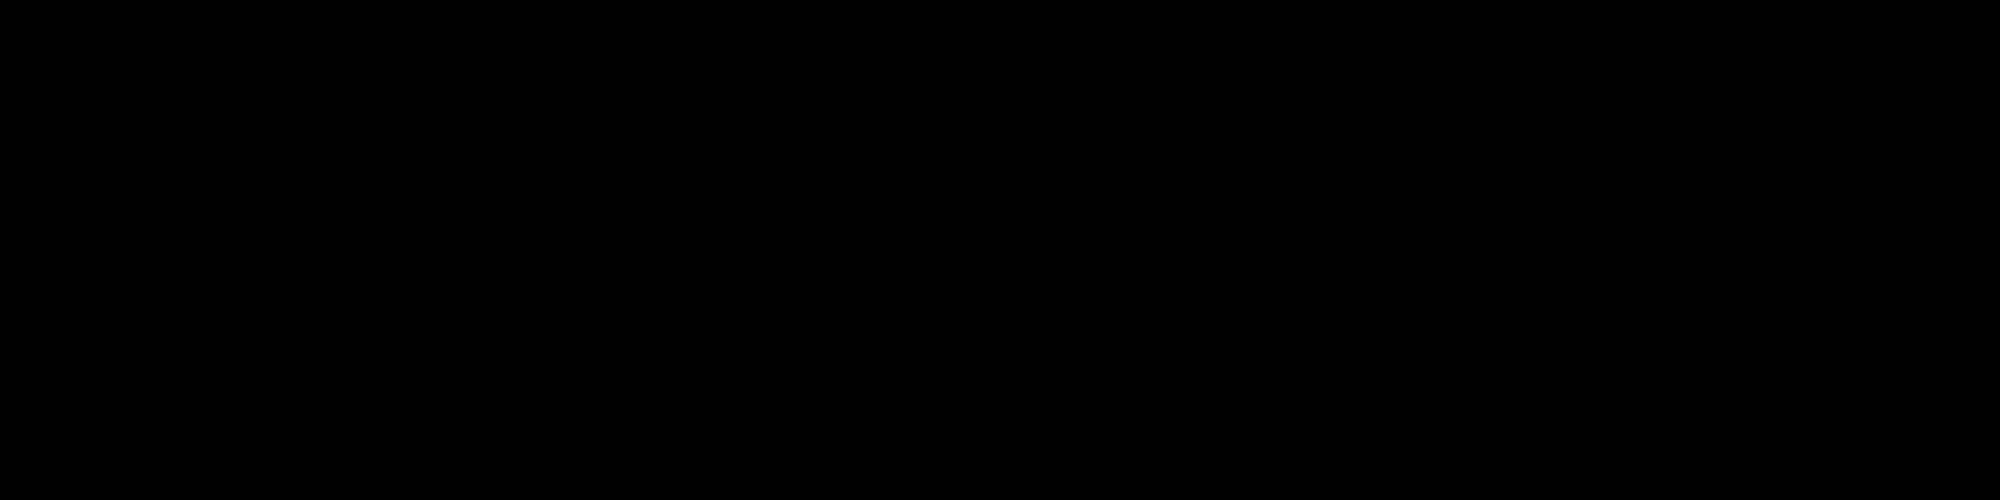 Symbol Inductor.